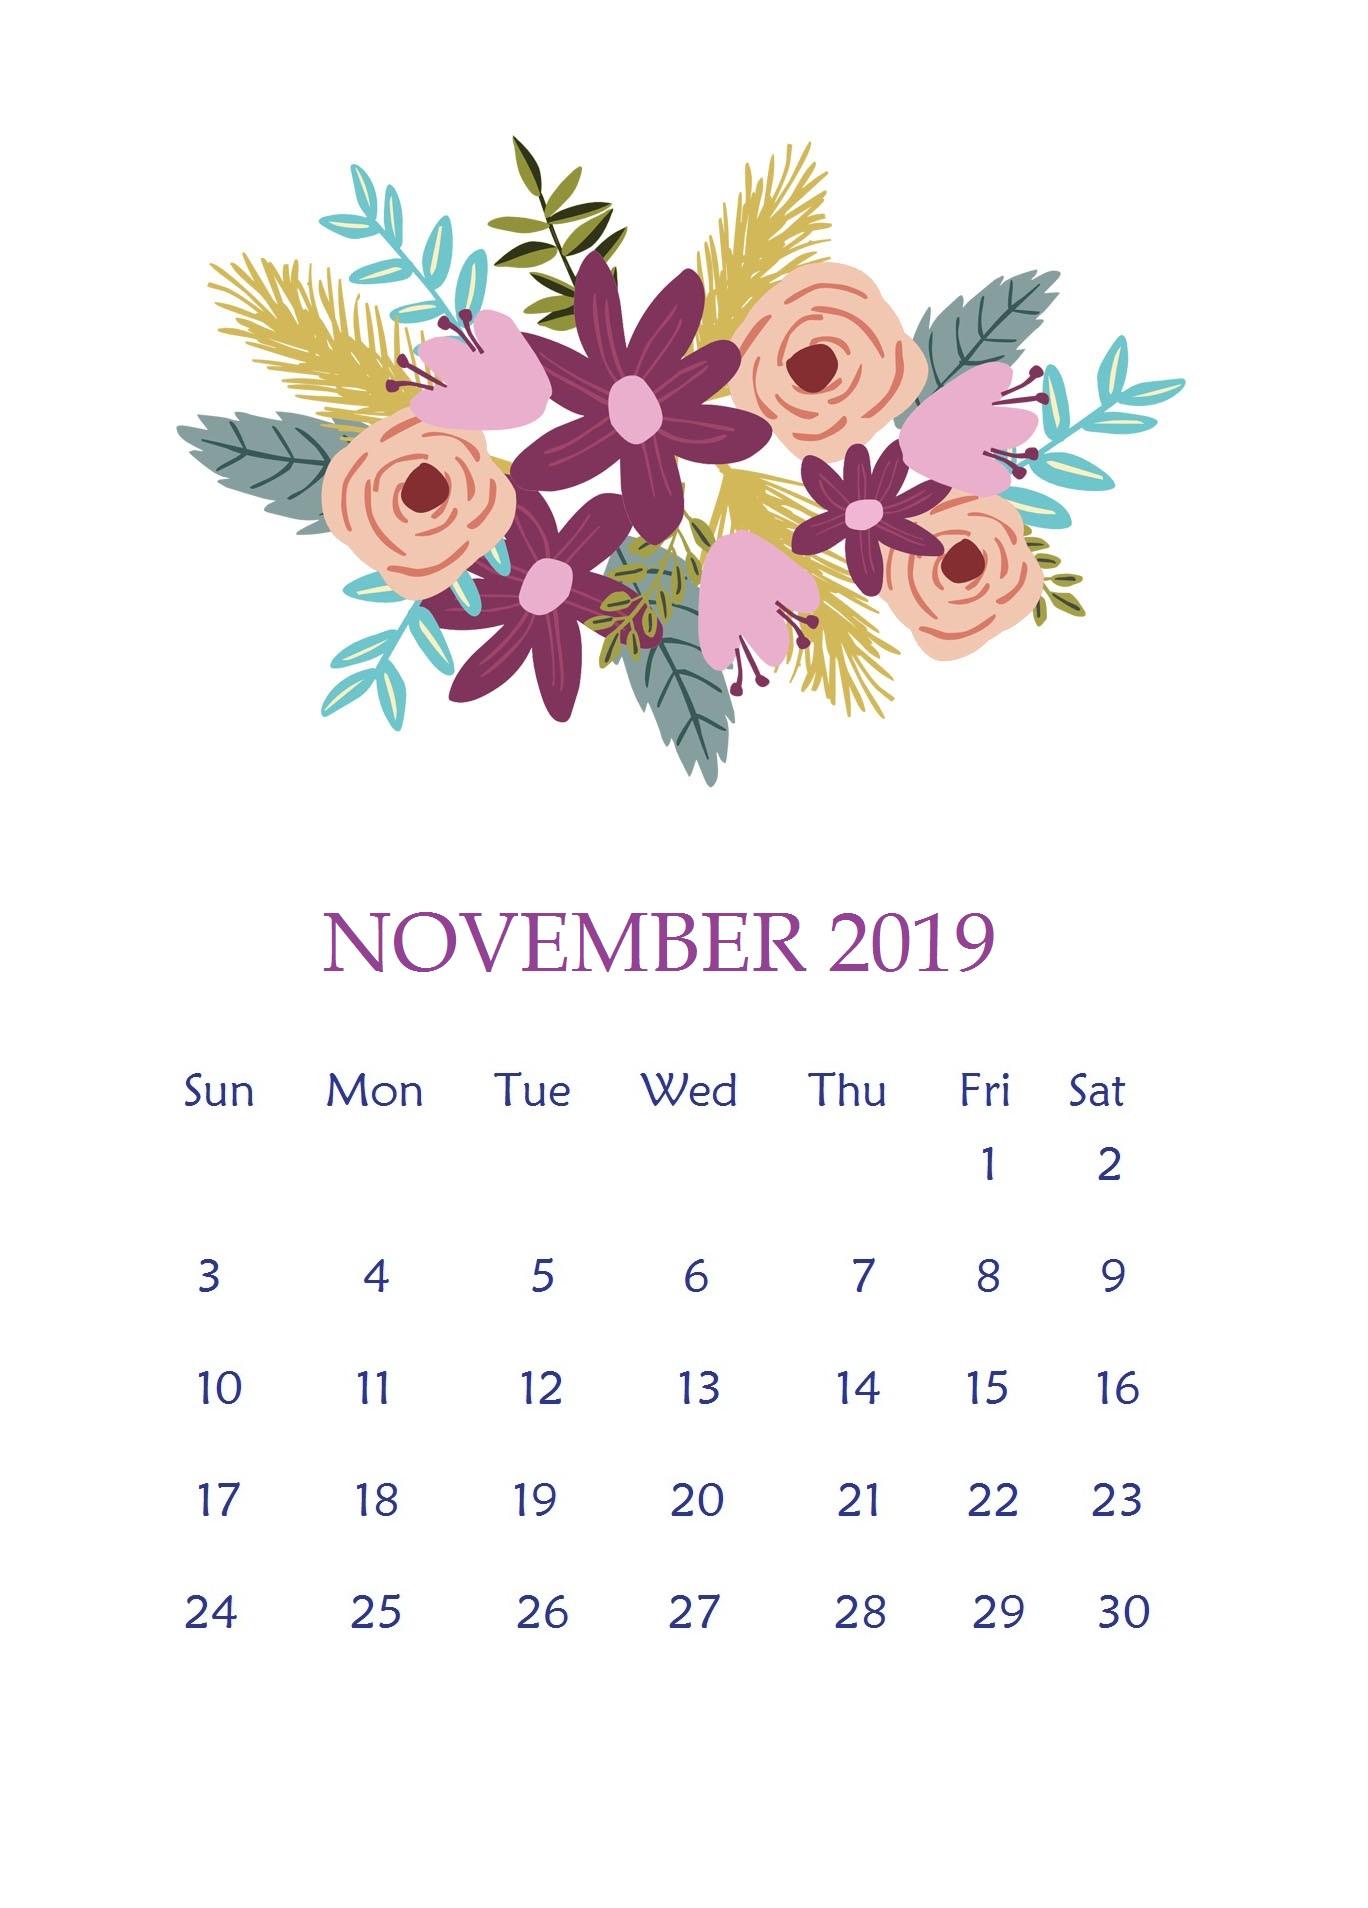 Floral November 2019 Wall Calendar